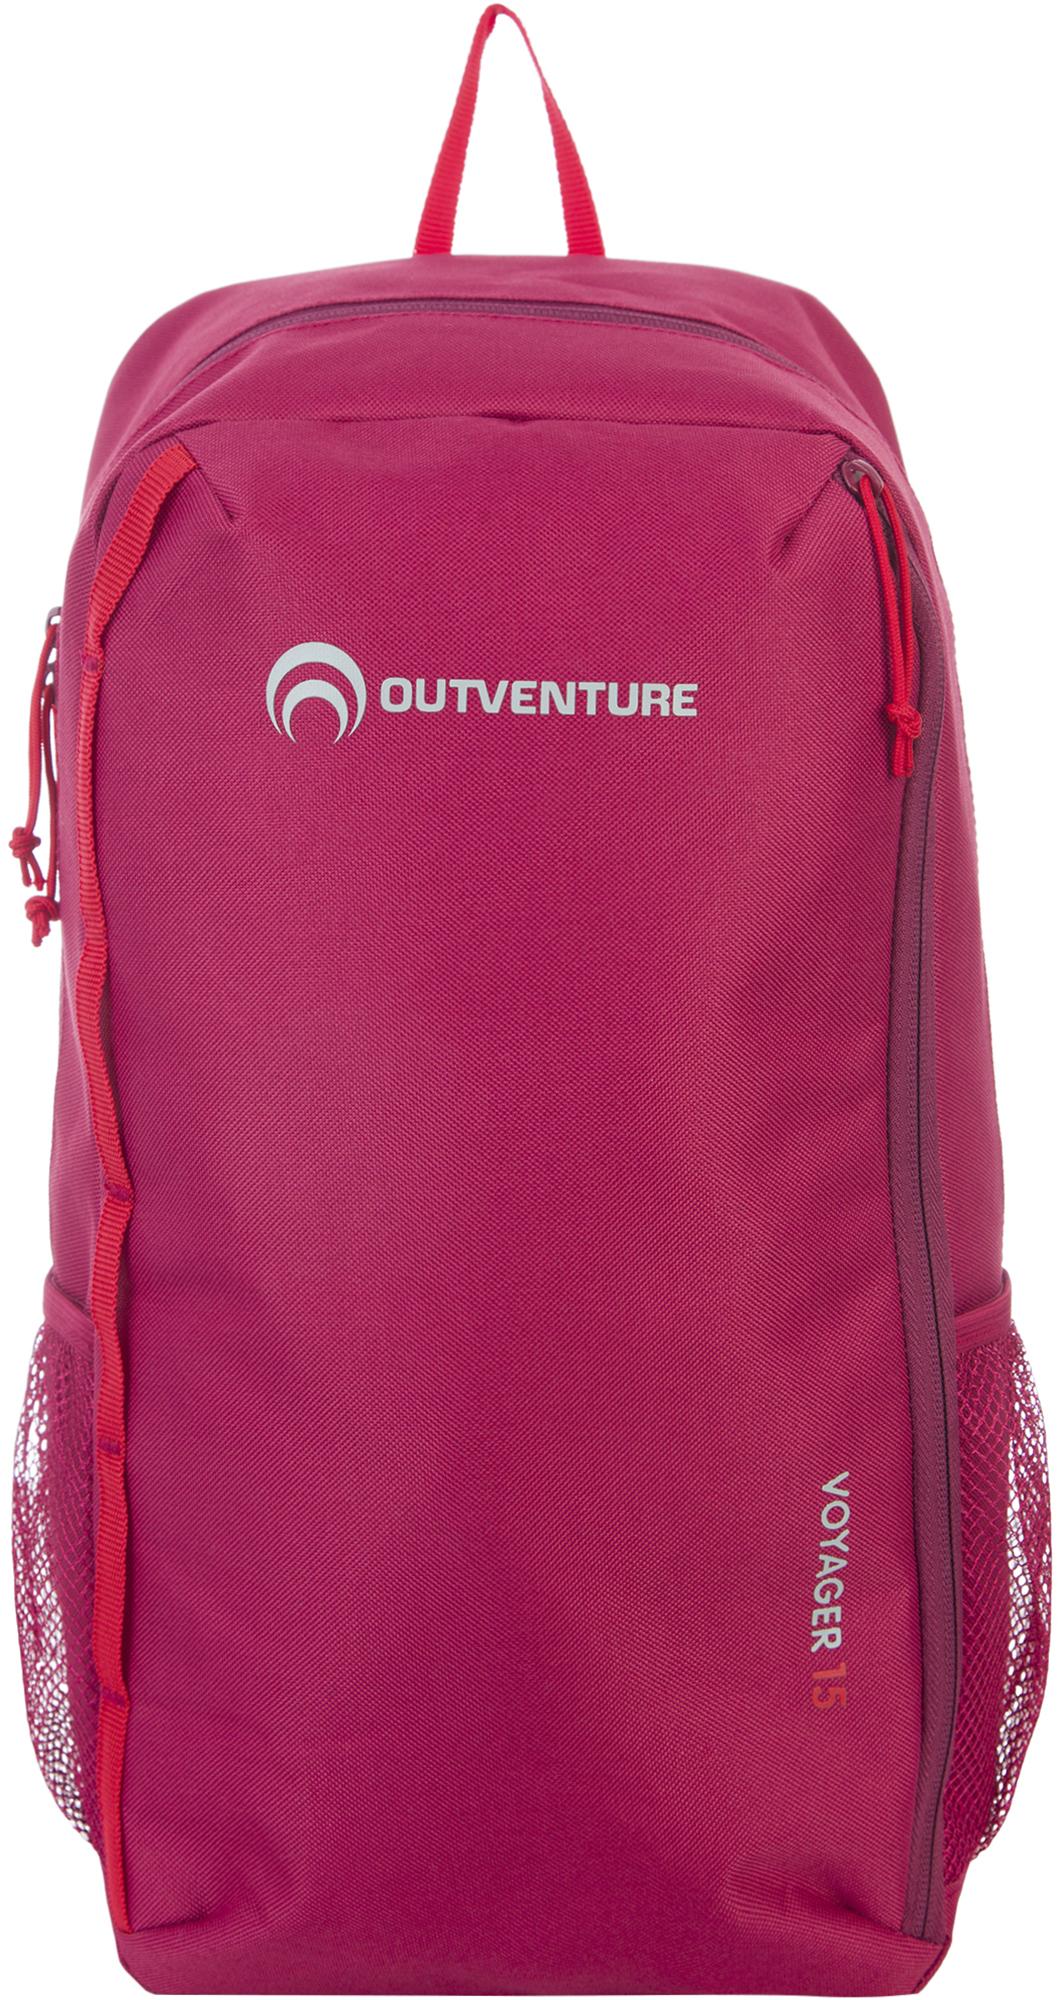 Outventure Outventure Voyager 15